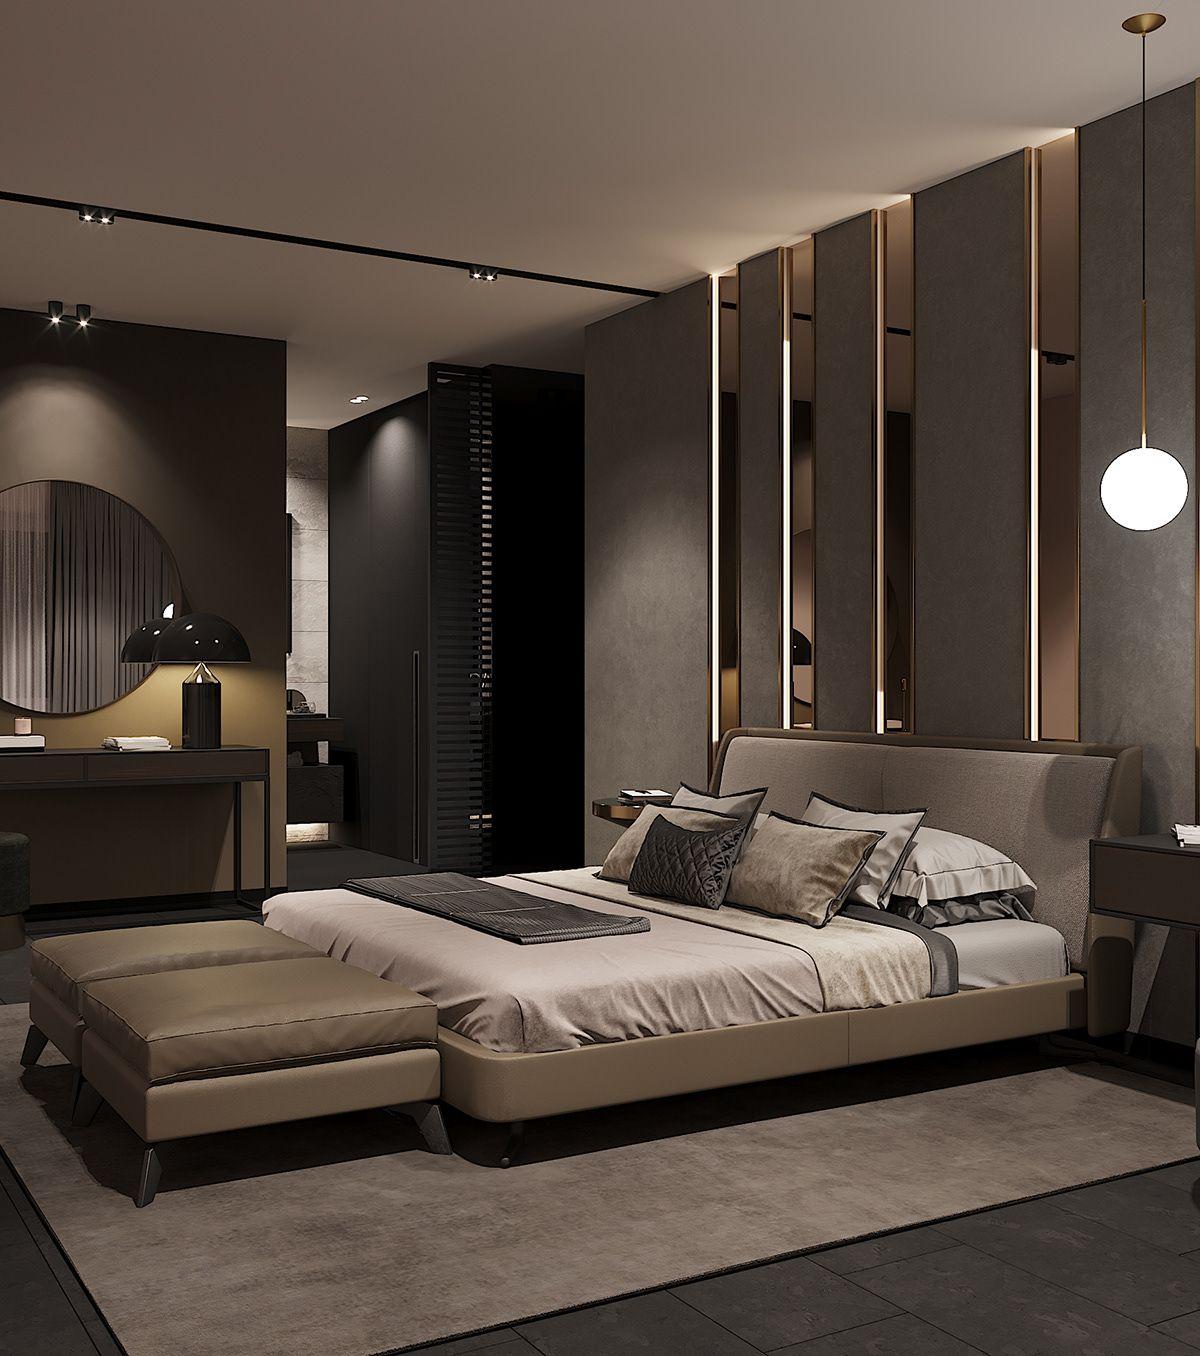 Contemporary Master Bedroom Interior Design